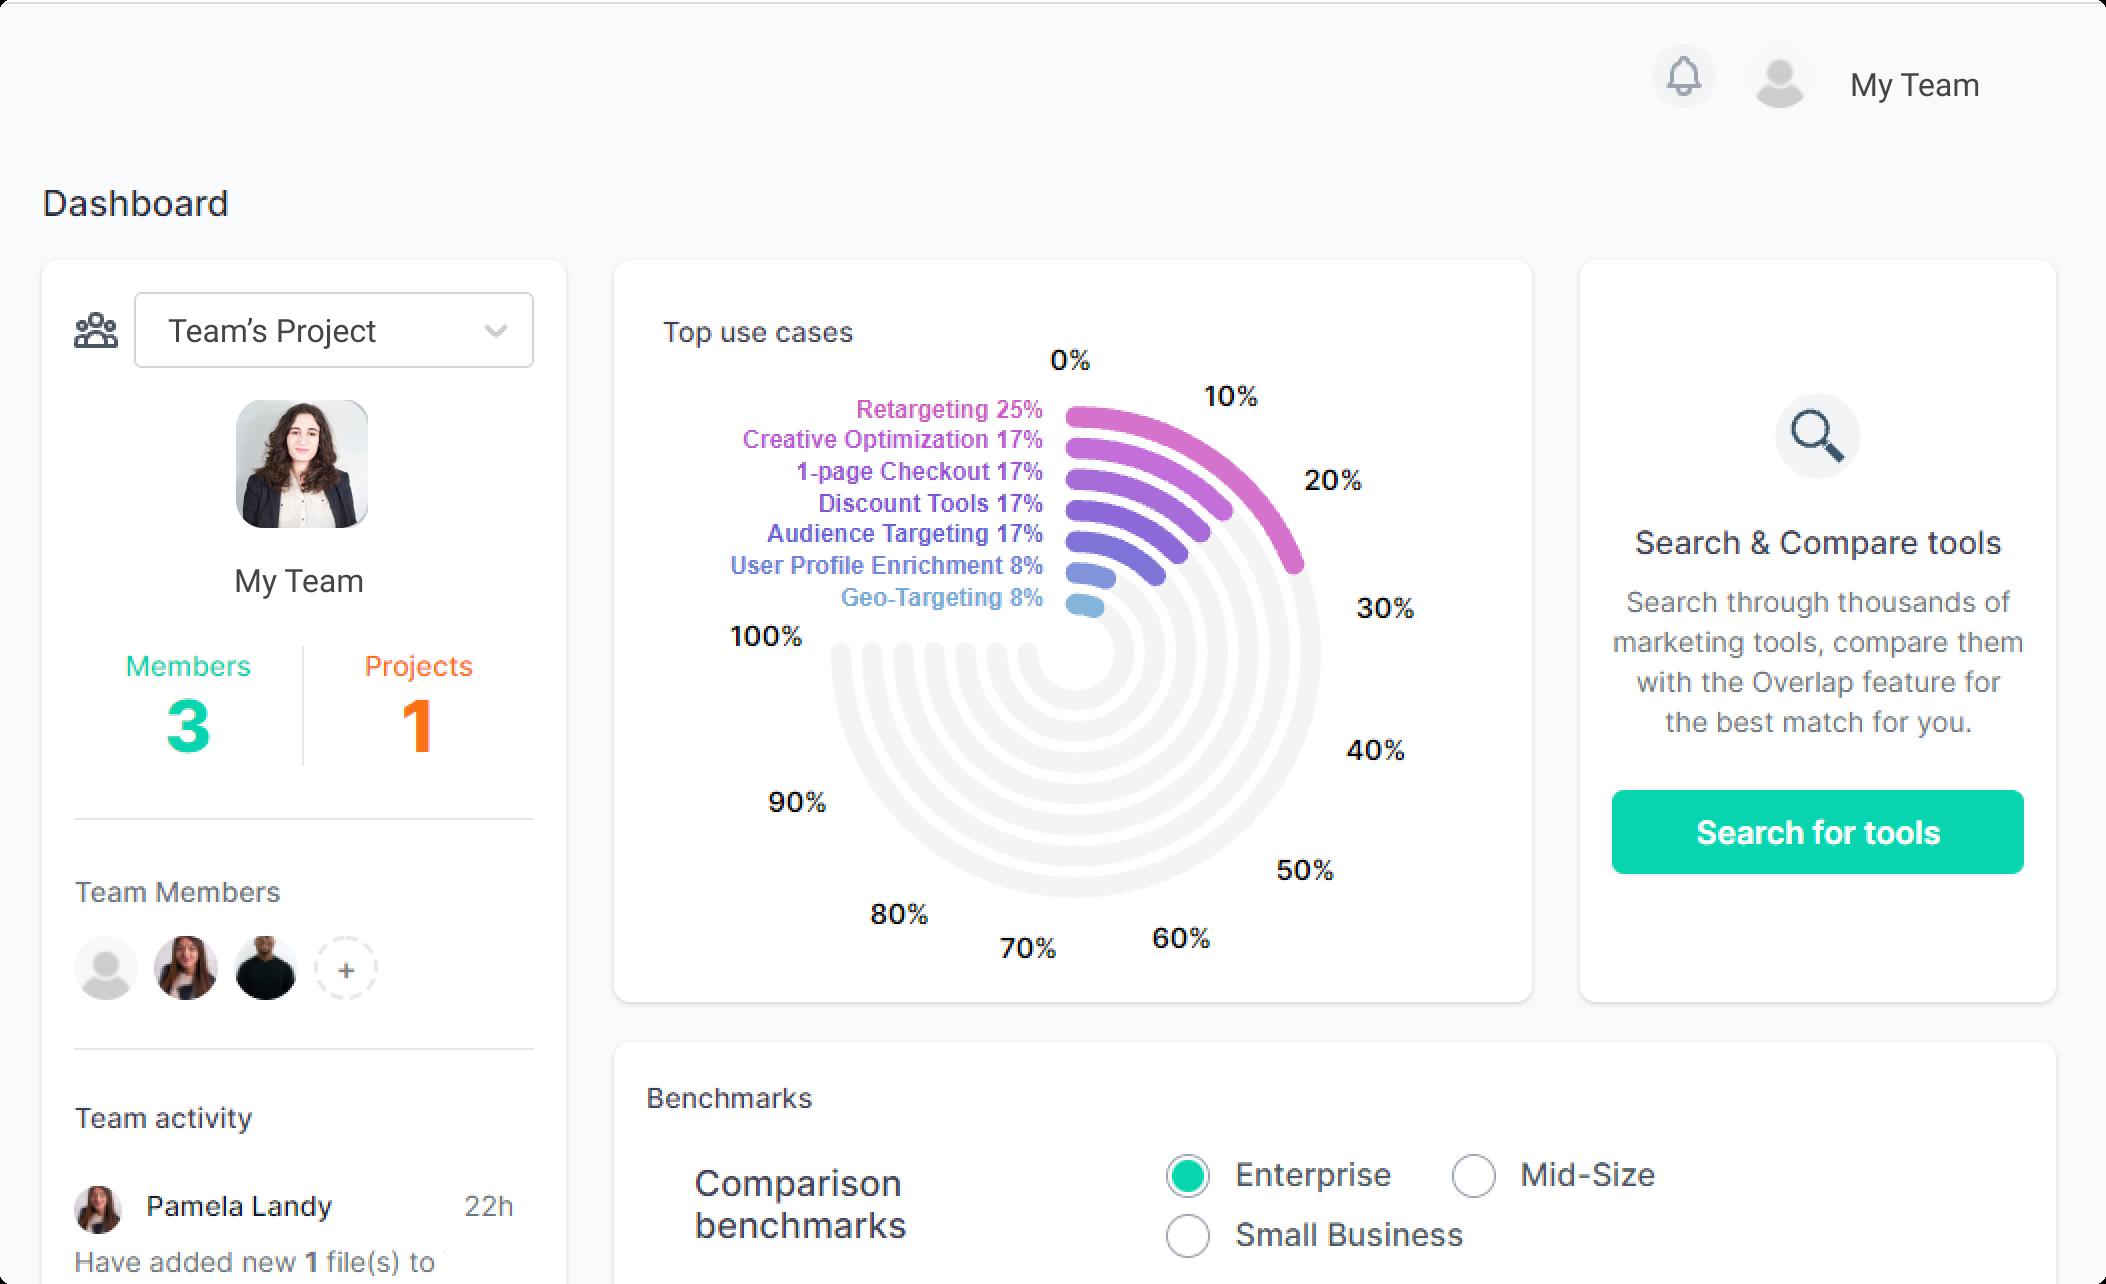 Stackbeam dashboard image